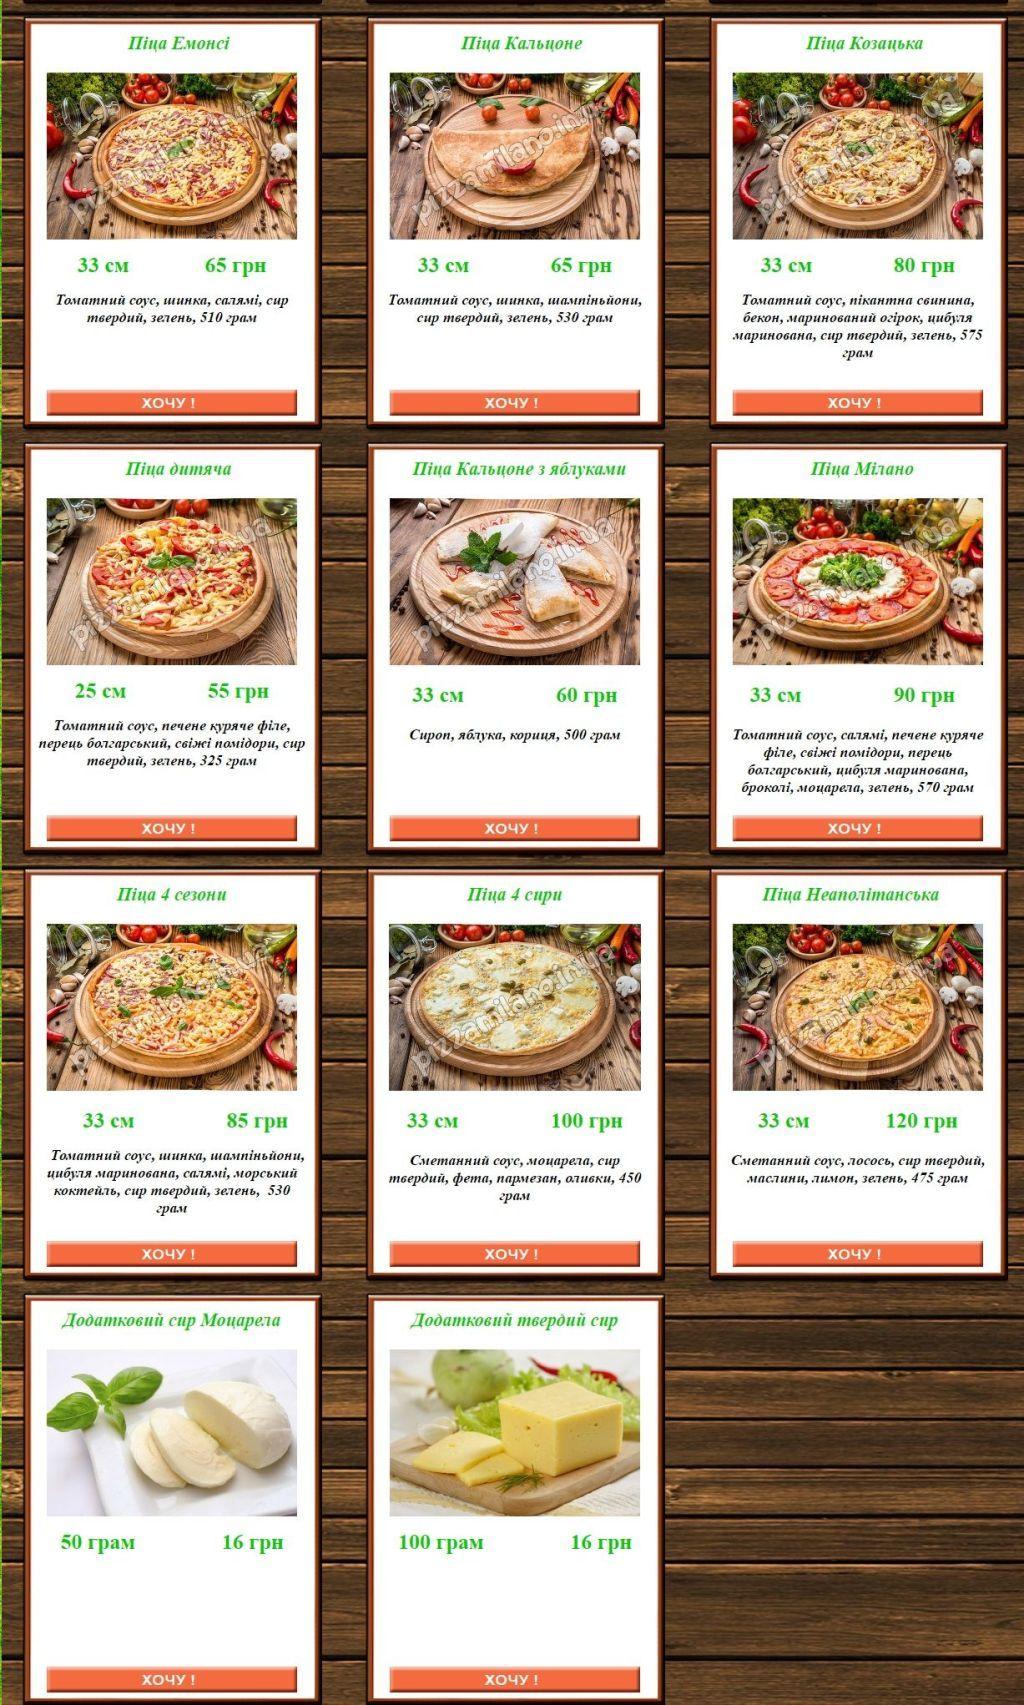 Меню Milano, кафе-пиццерия - страница 2